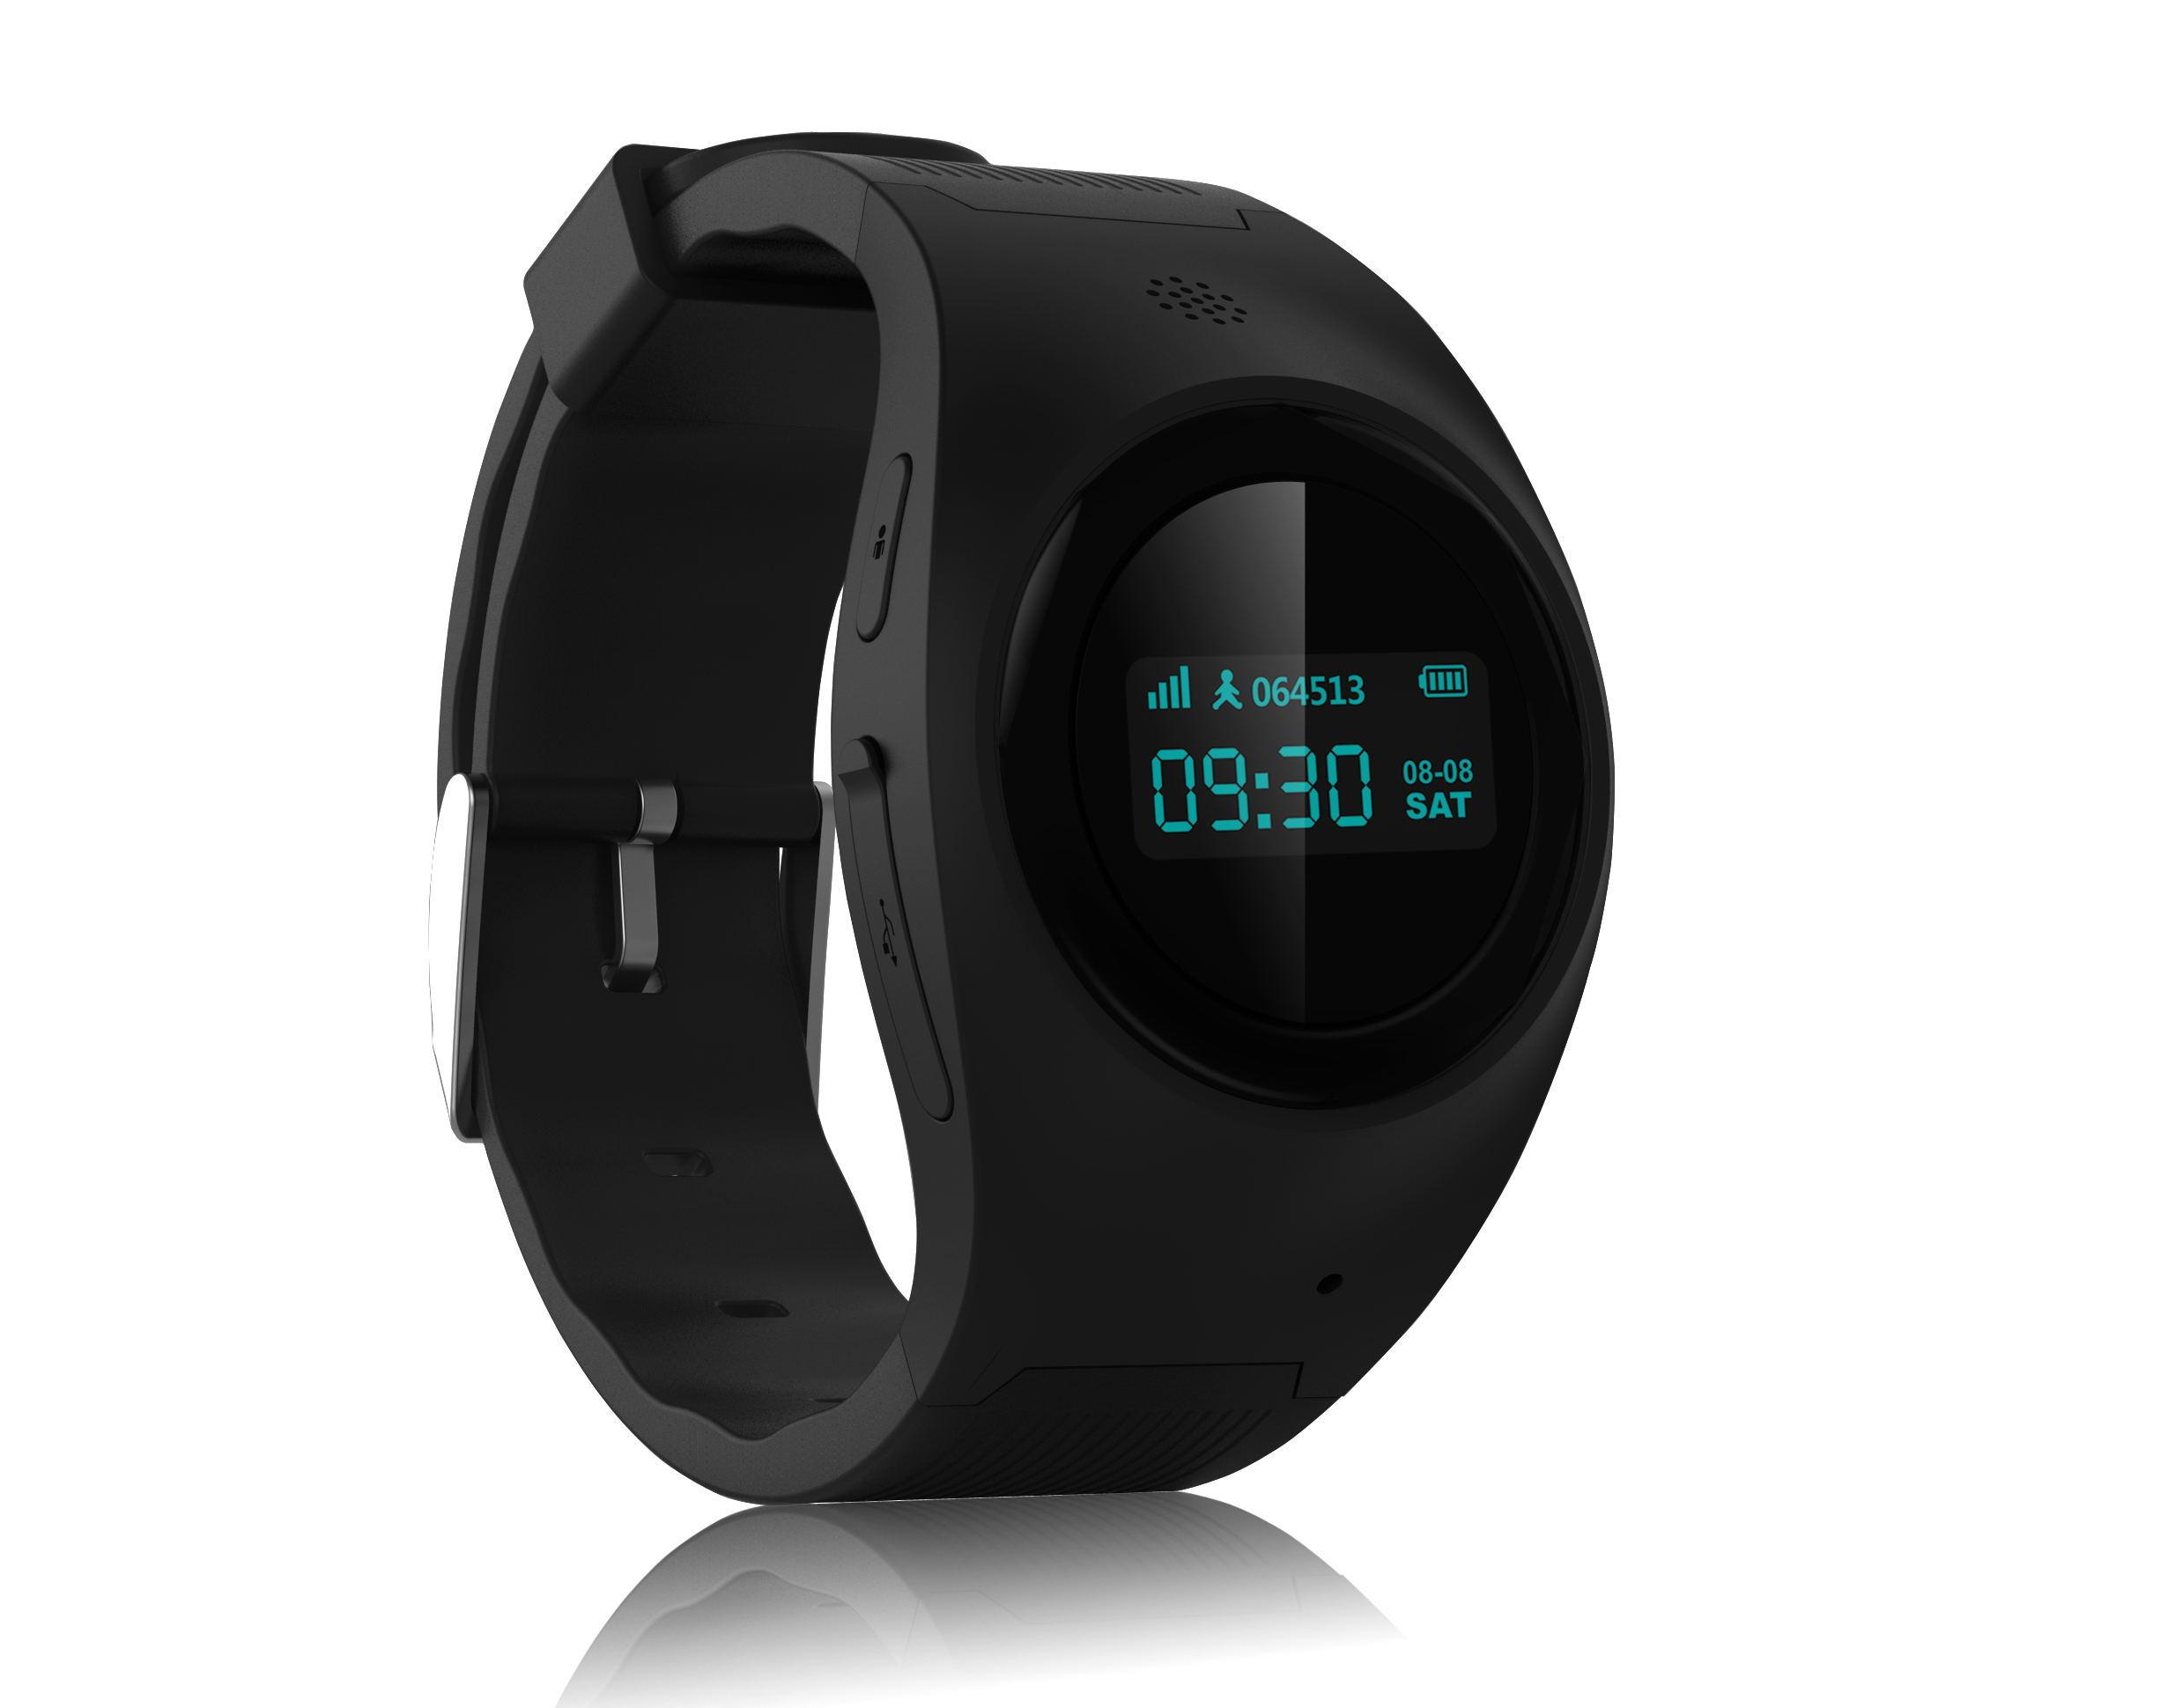 Best Quality Small Black GPS Kids Tracker Watch